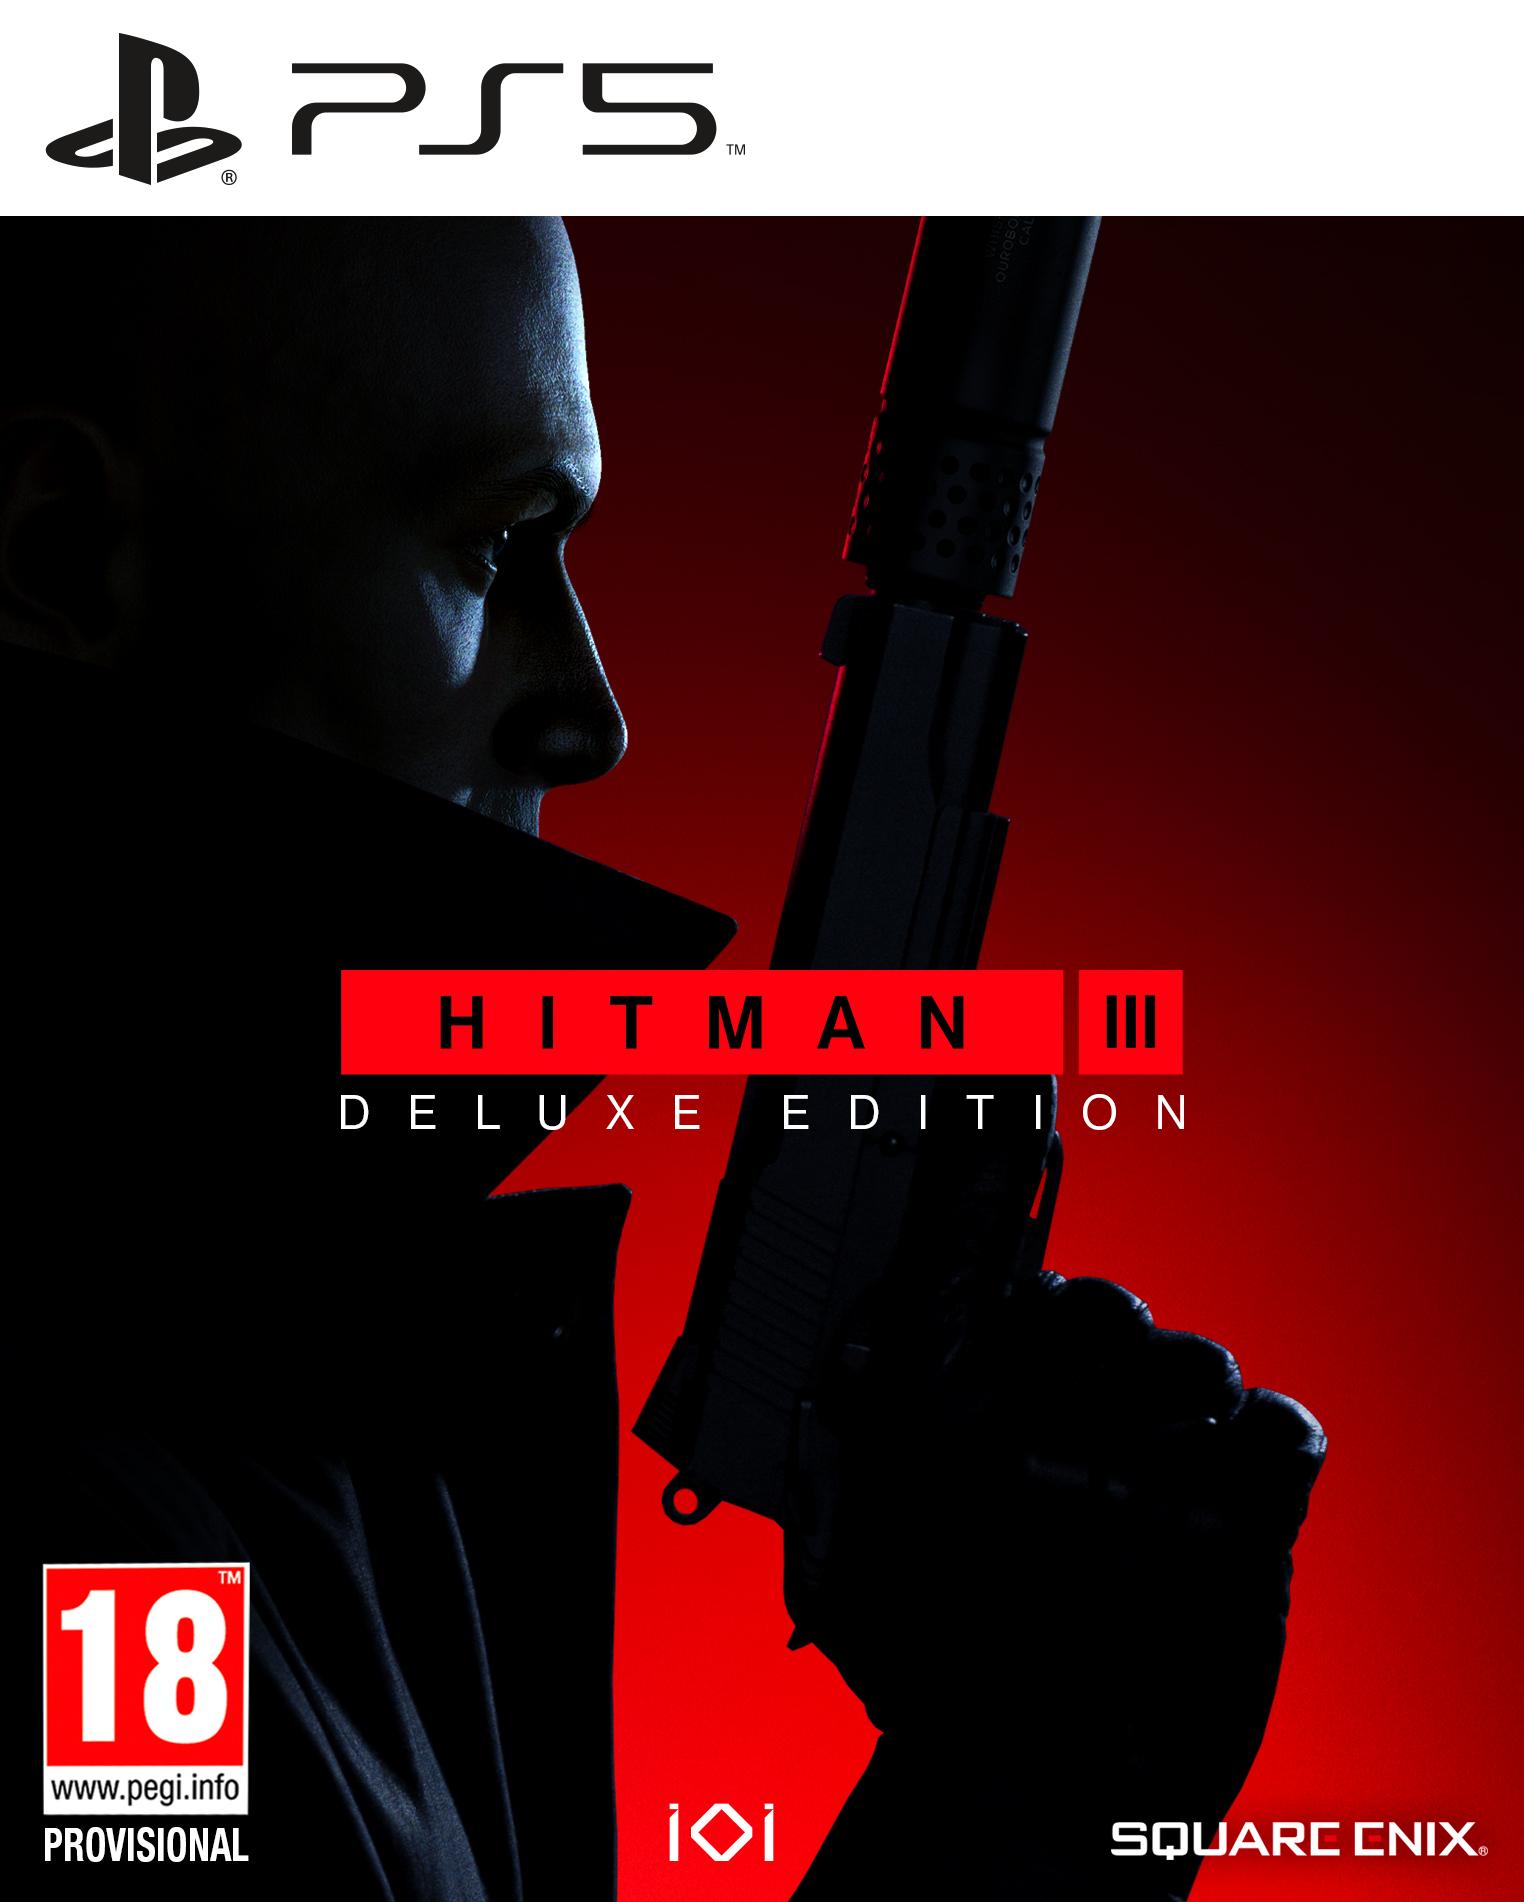 HITMAN III DELUXE EDITION PS5 | Square Enix Boutique